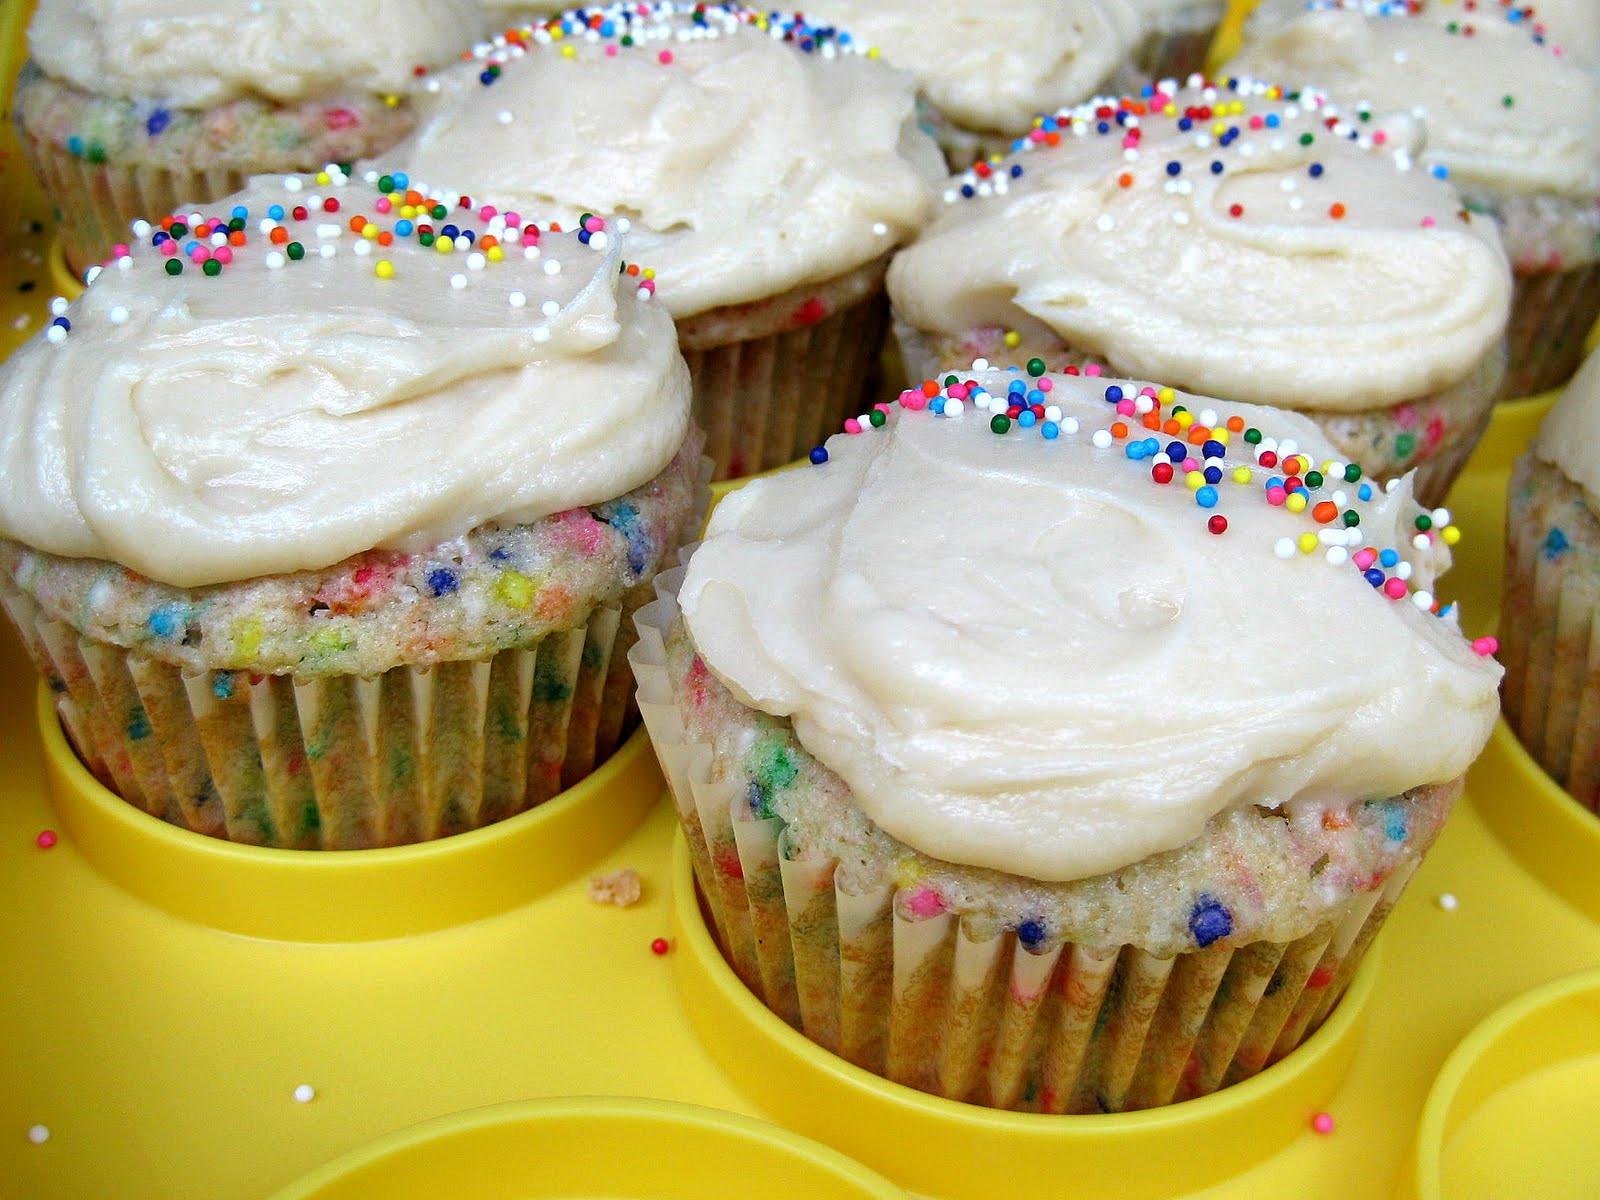 How To Make Homemade Cupcakes  Homemade Funfetti Cupcakes with Vanilla Buttercream